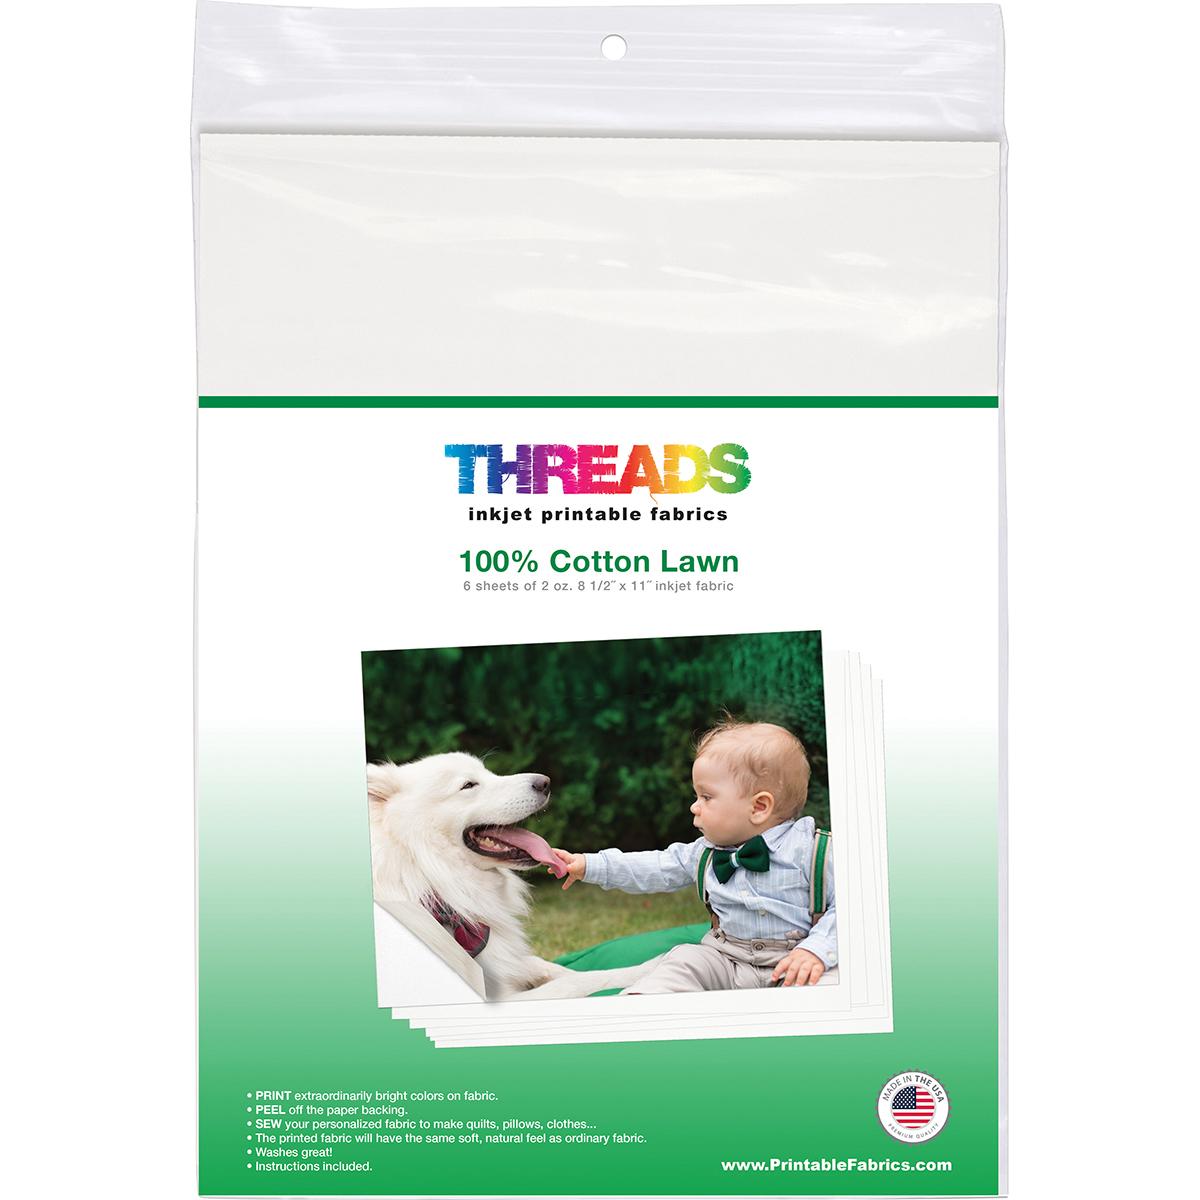 "THREADS Inkjet Printable Fabric Sheets 8.5""X11"" 6/Pkg-100% Cotton Lawn"